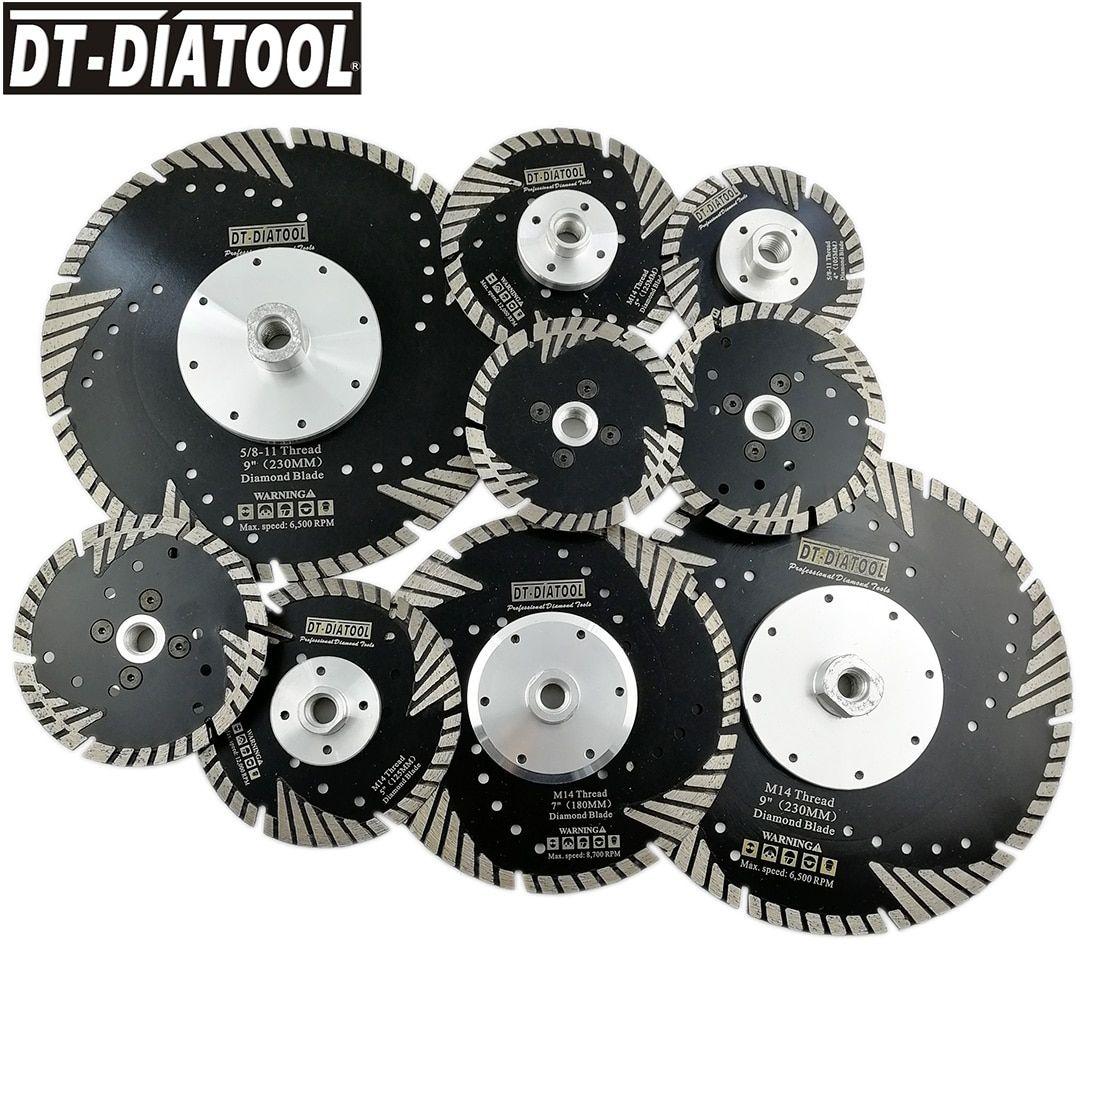 1pc Hot Pressed Diamond Turbo Blade with Slant Protection